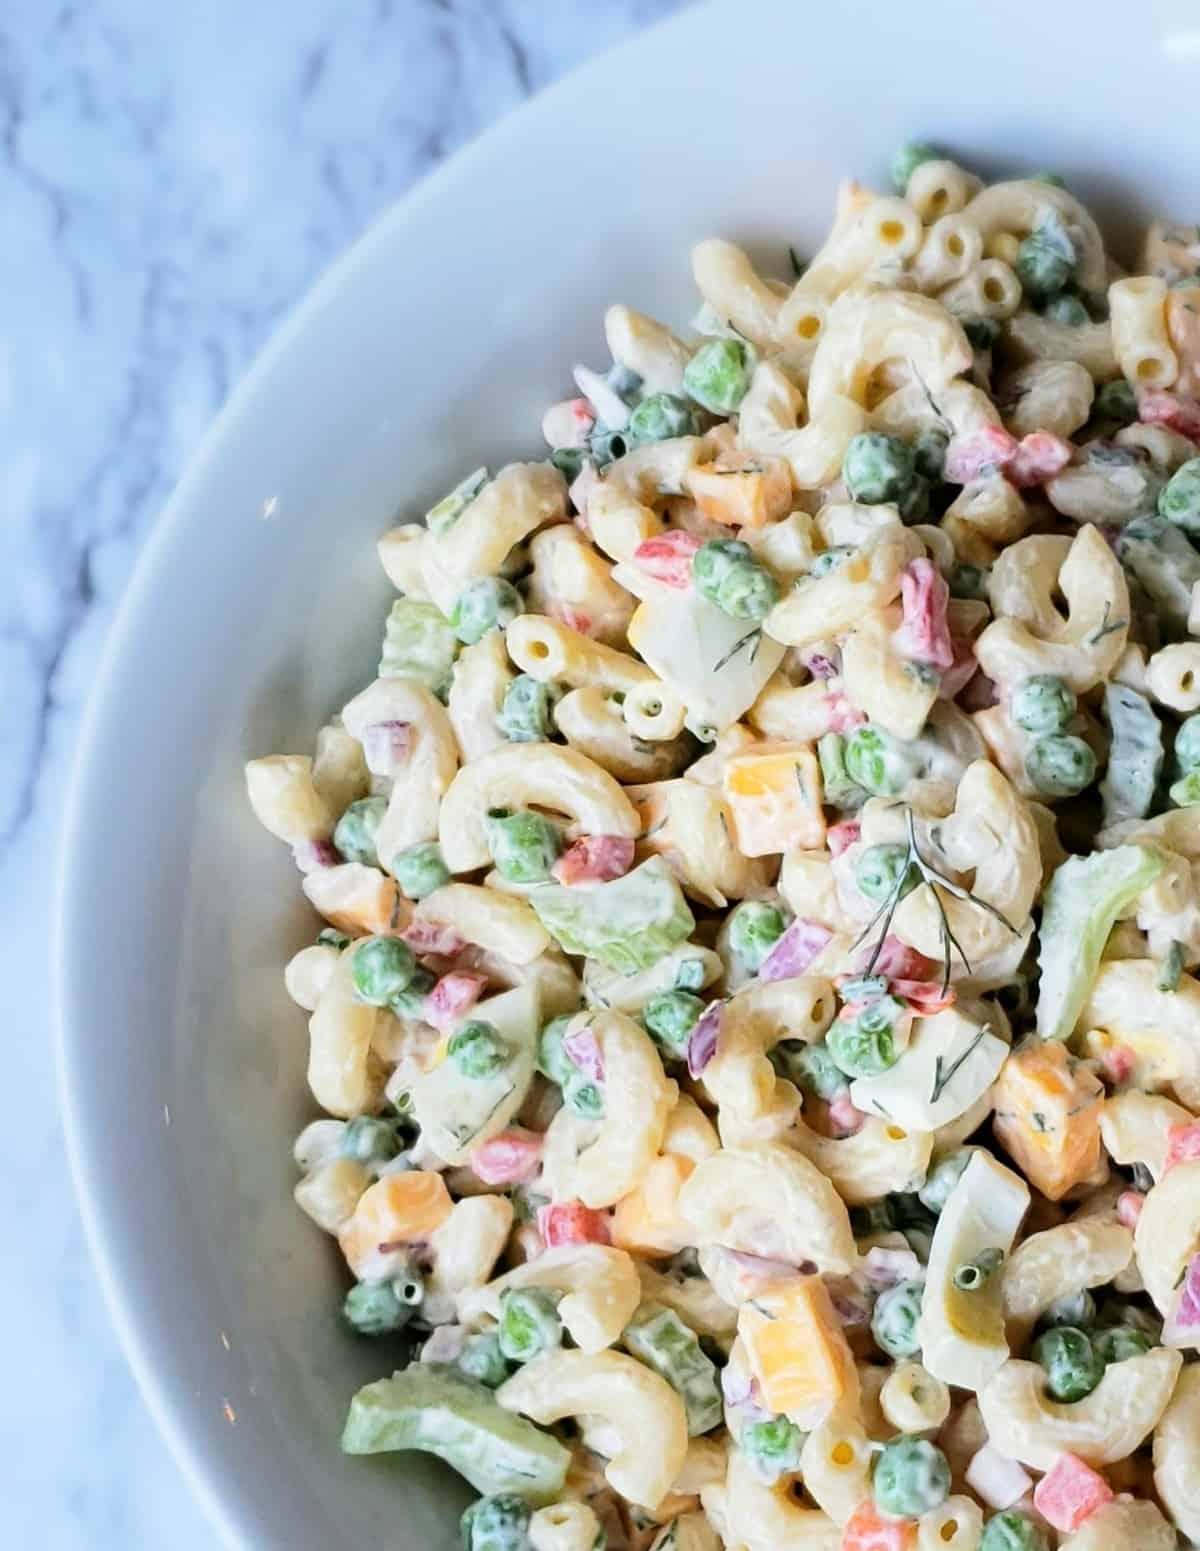 Close up edge of white bowl of macaroni salad on marble surface